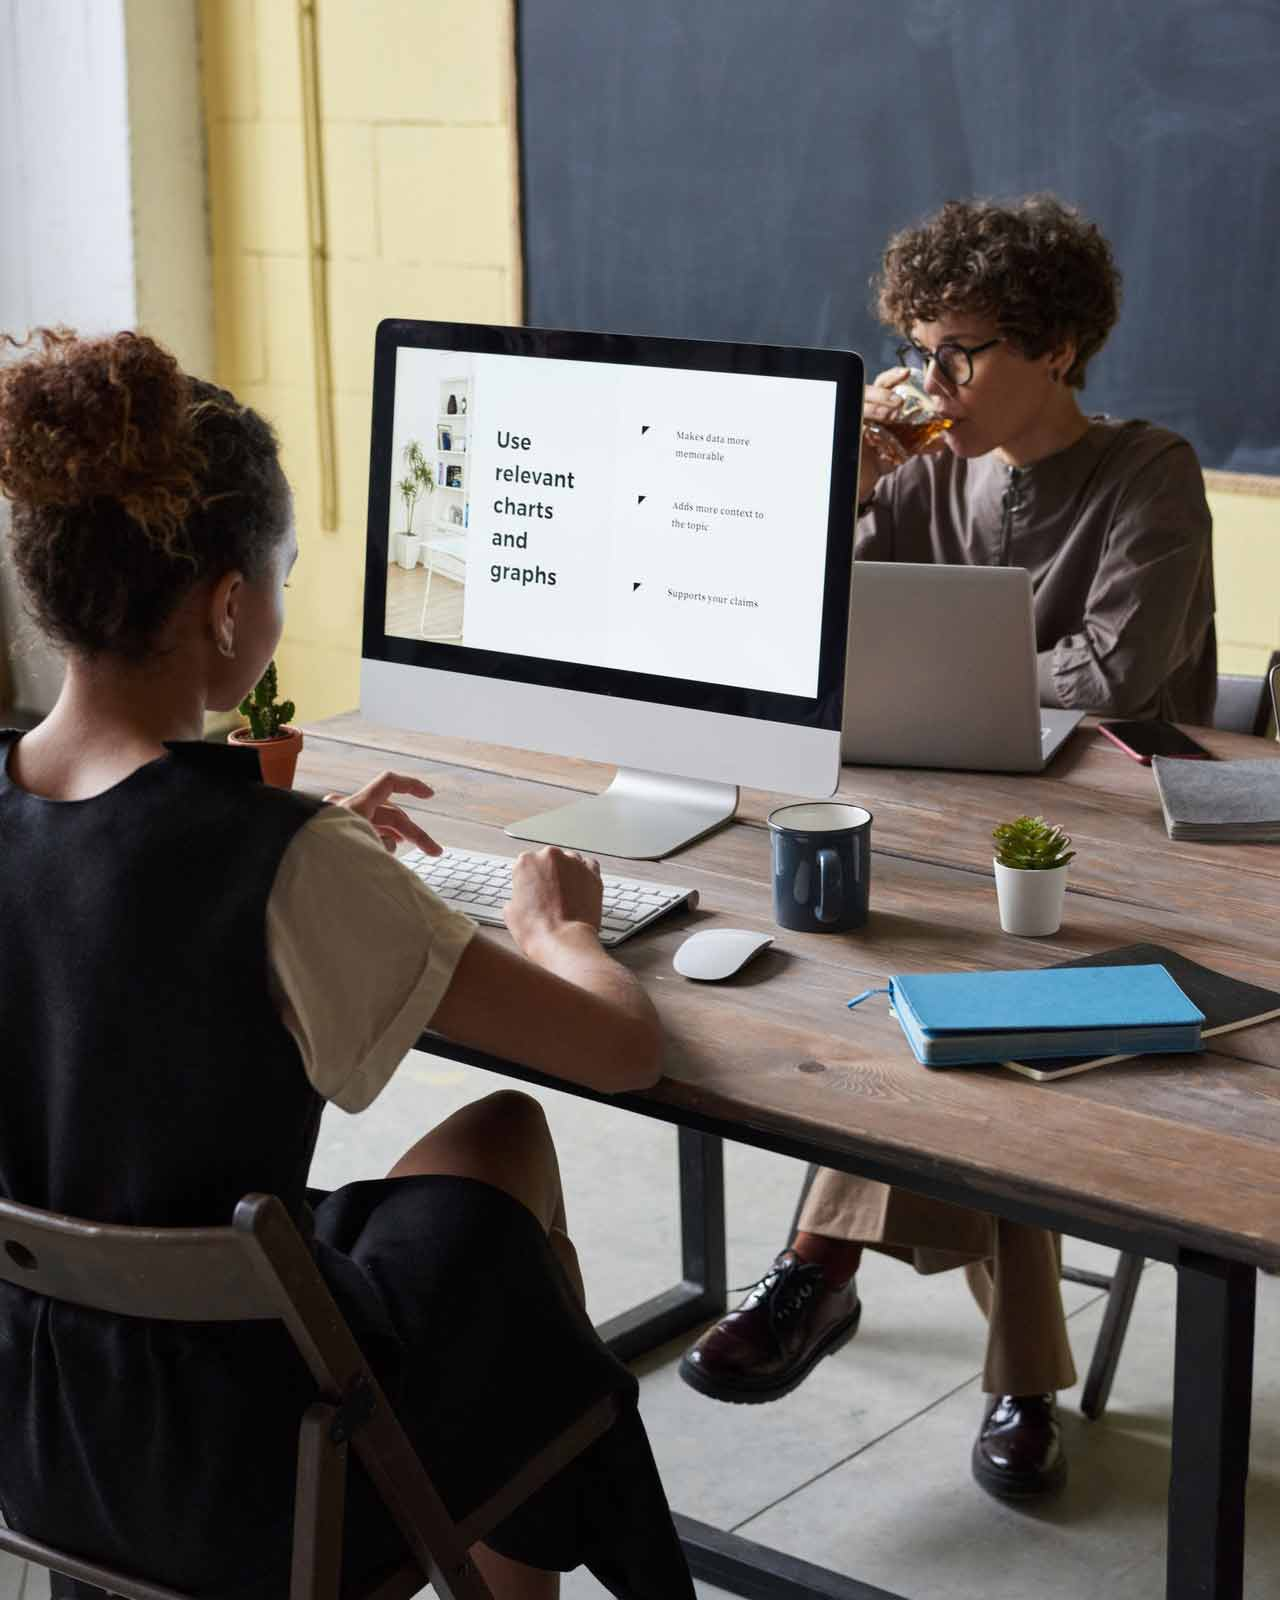 women-using-computers-3184348